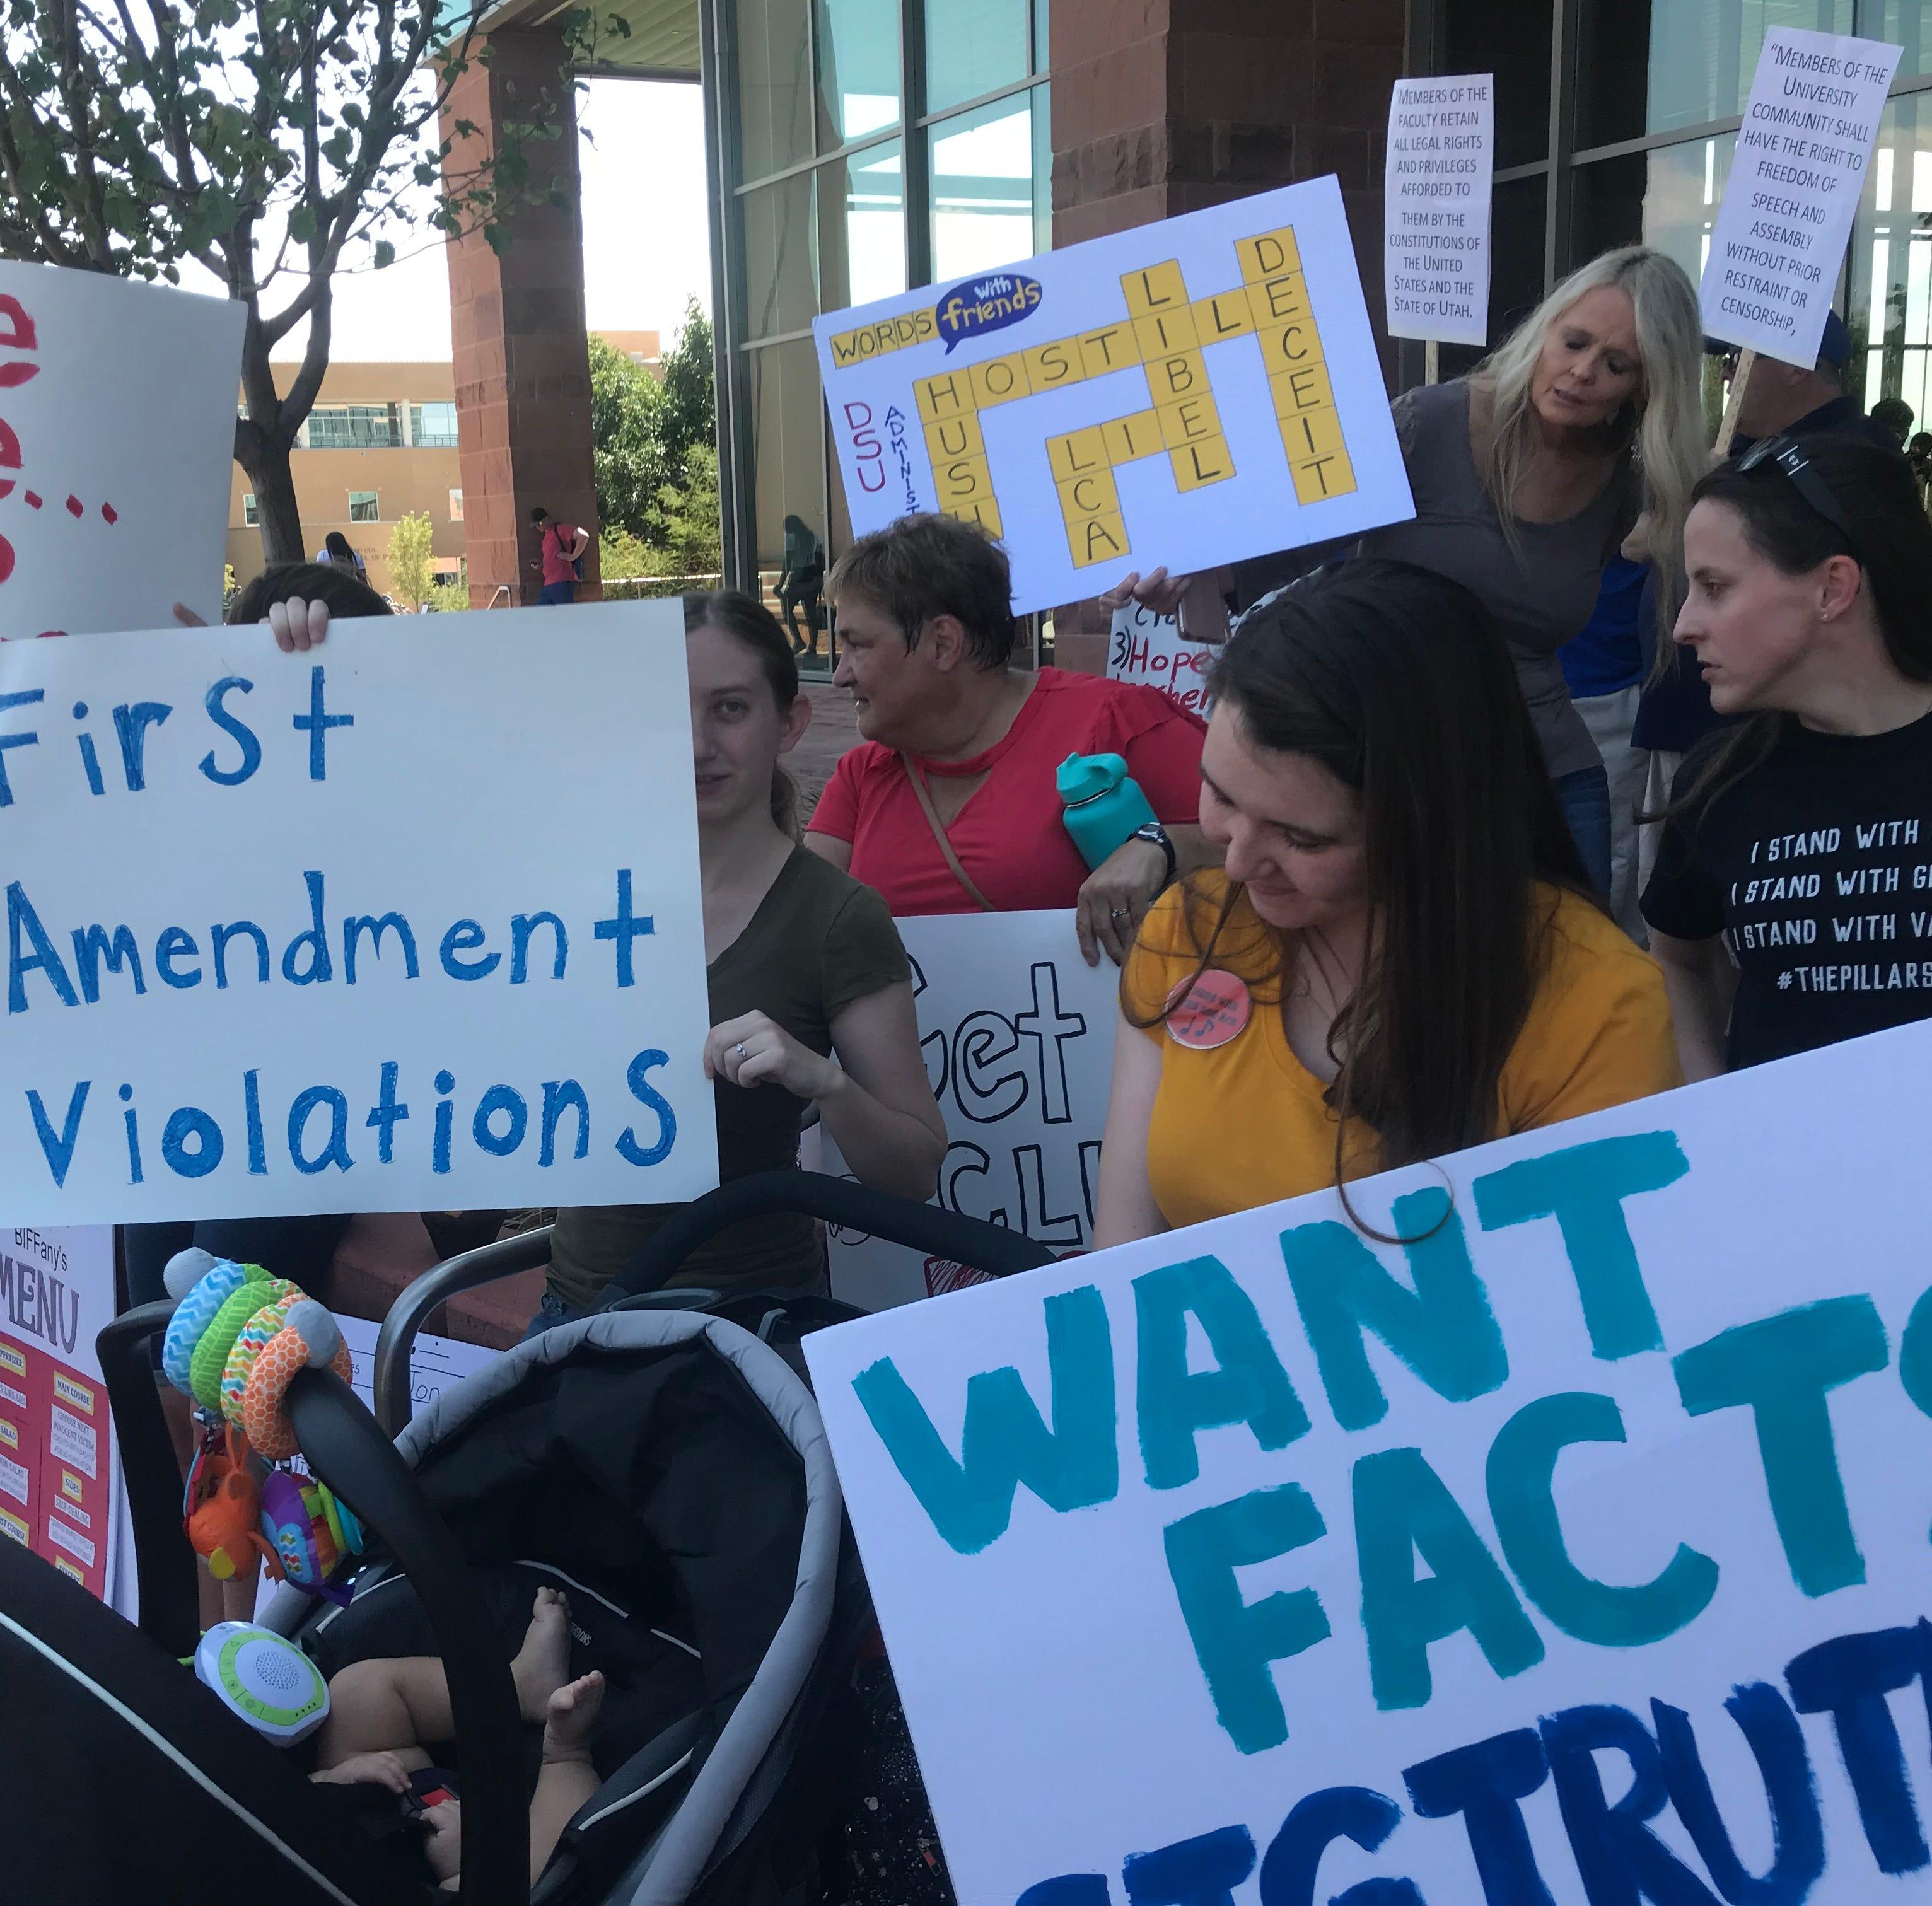 Professor in limbo over job joins DSU protest